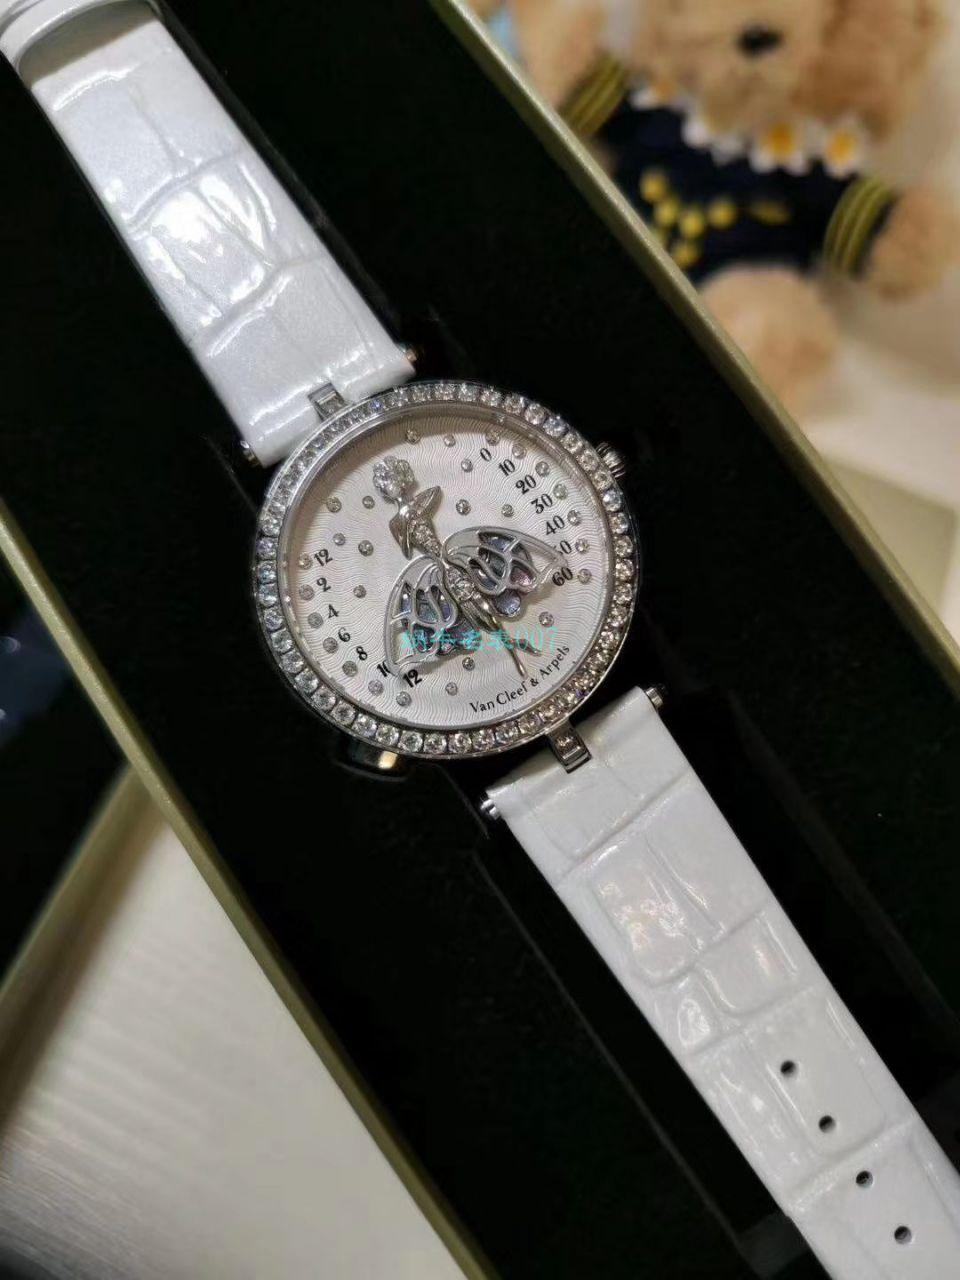 【5G厂Van Cleef & Arpels复刻女表舞动天使】梵克雅宝诗意复杂功能系列VCARO4F200腕表